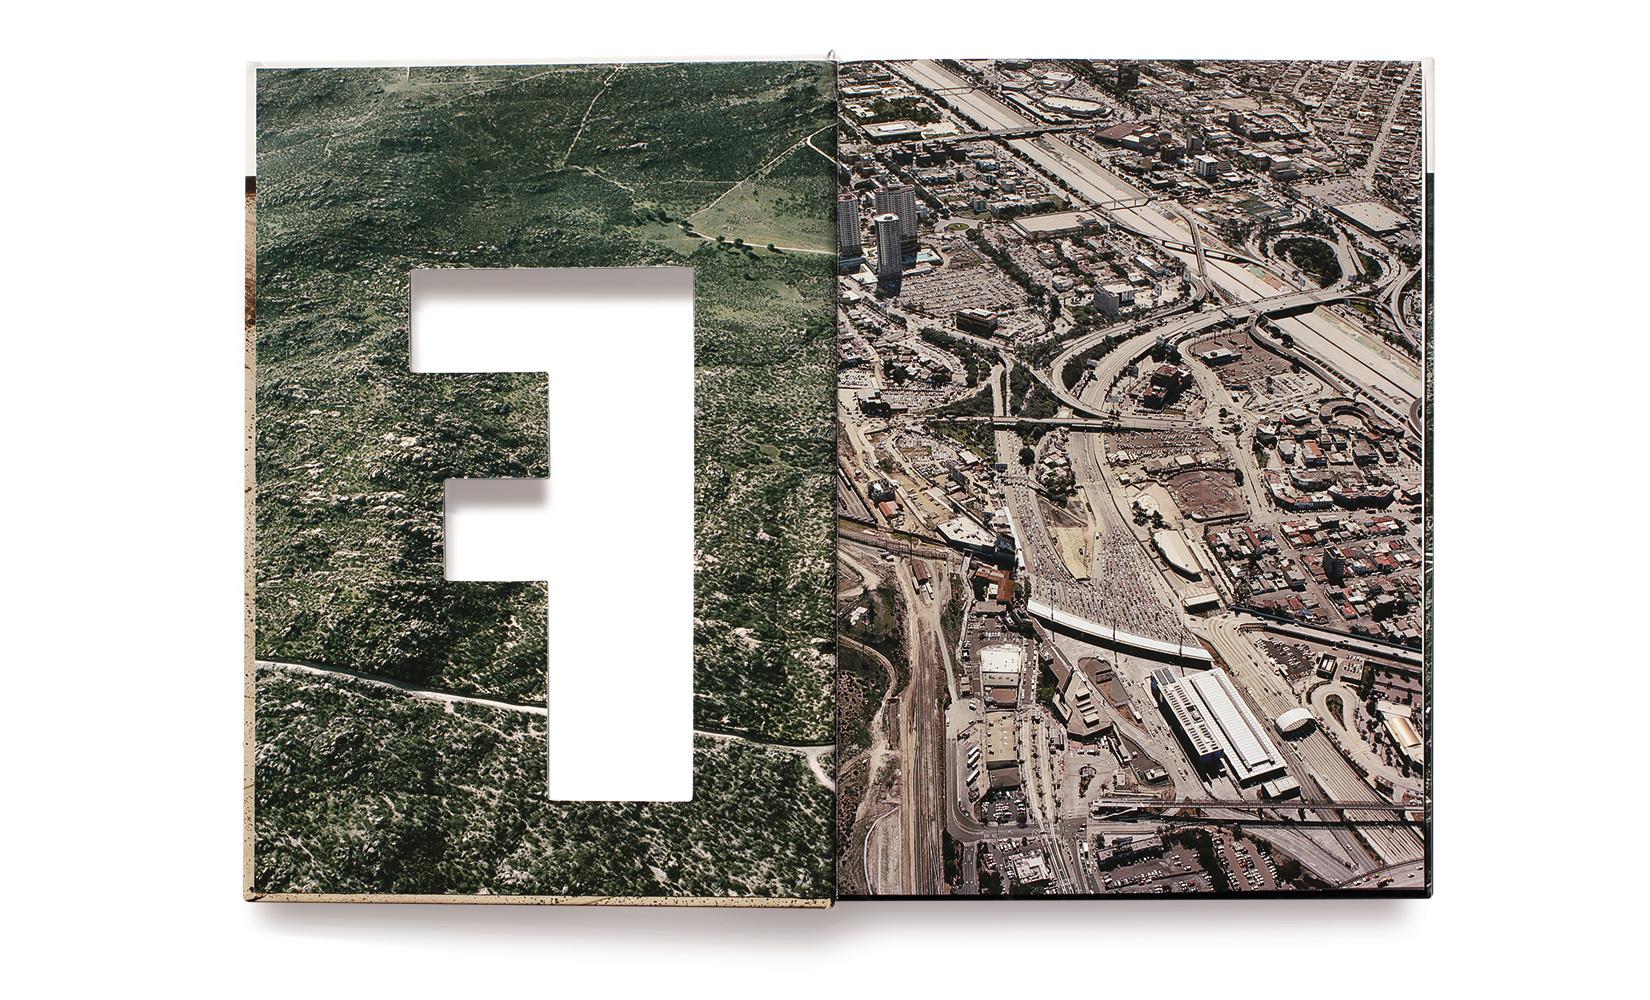 01-olivier-andreotti-toluca-studio-frontera-02.jpg